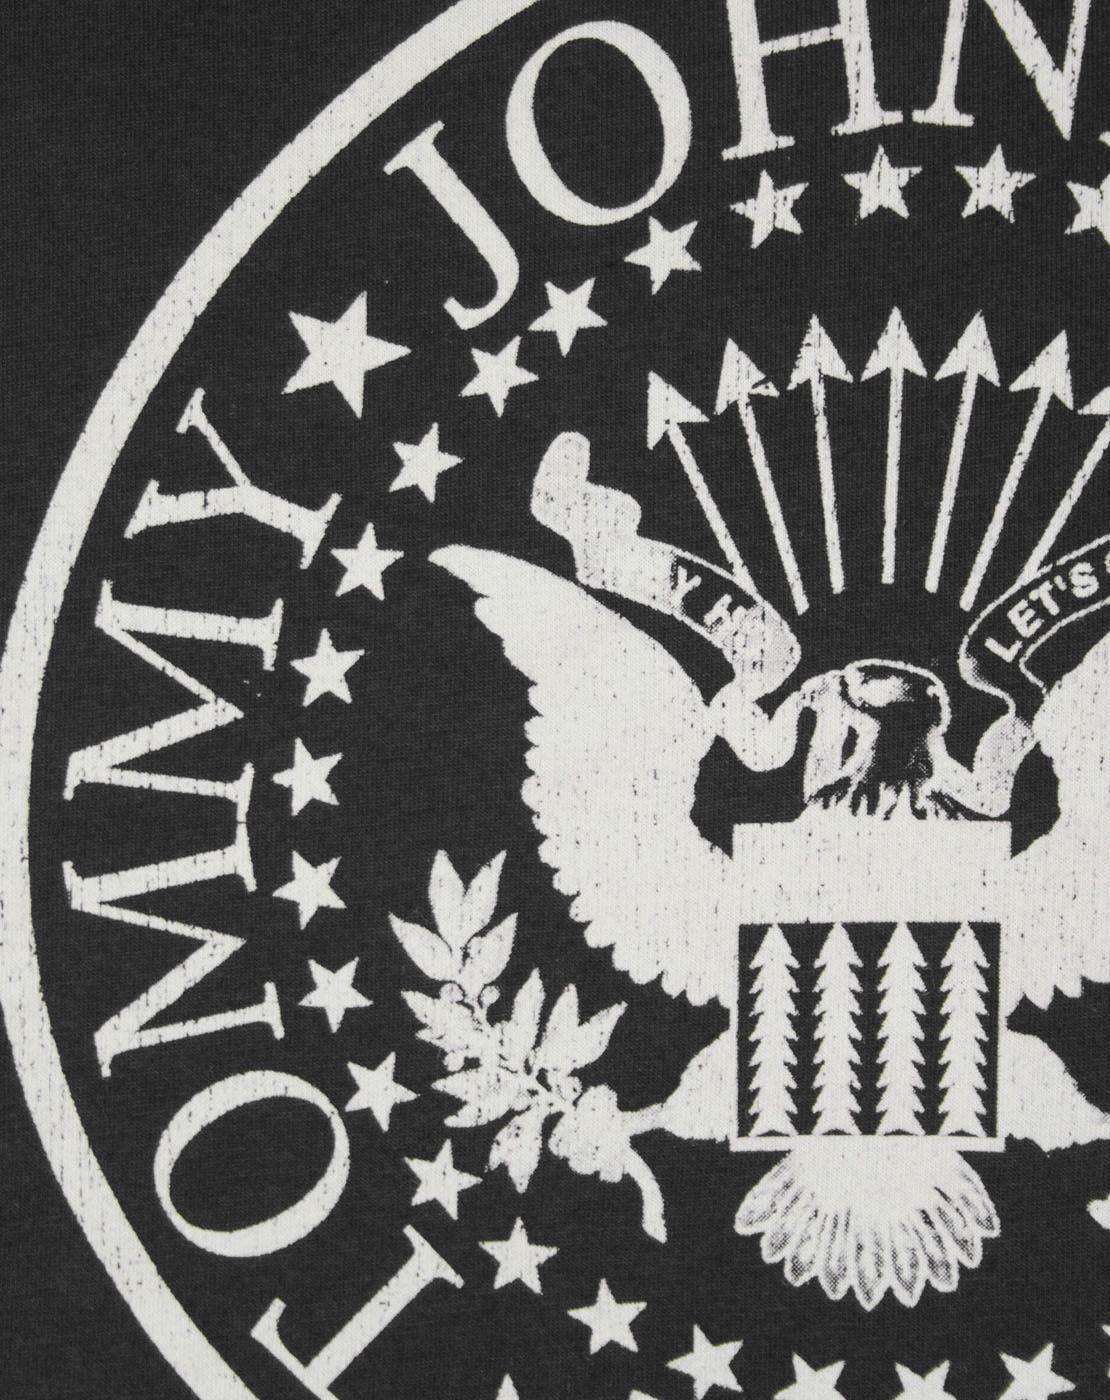 Amplified-Ramones-Seal-Logo-Women-039-s-Sheer-Panel-T-Shirt thumbnail 8